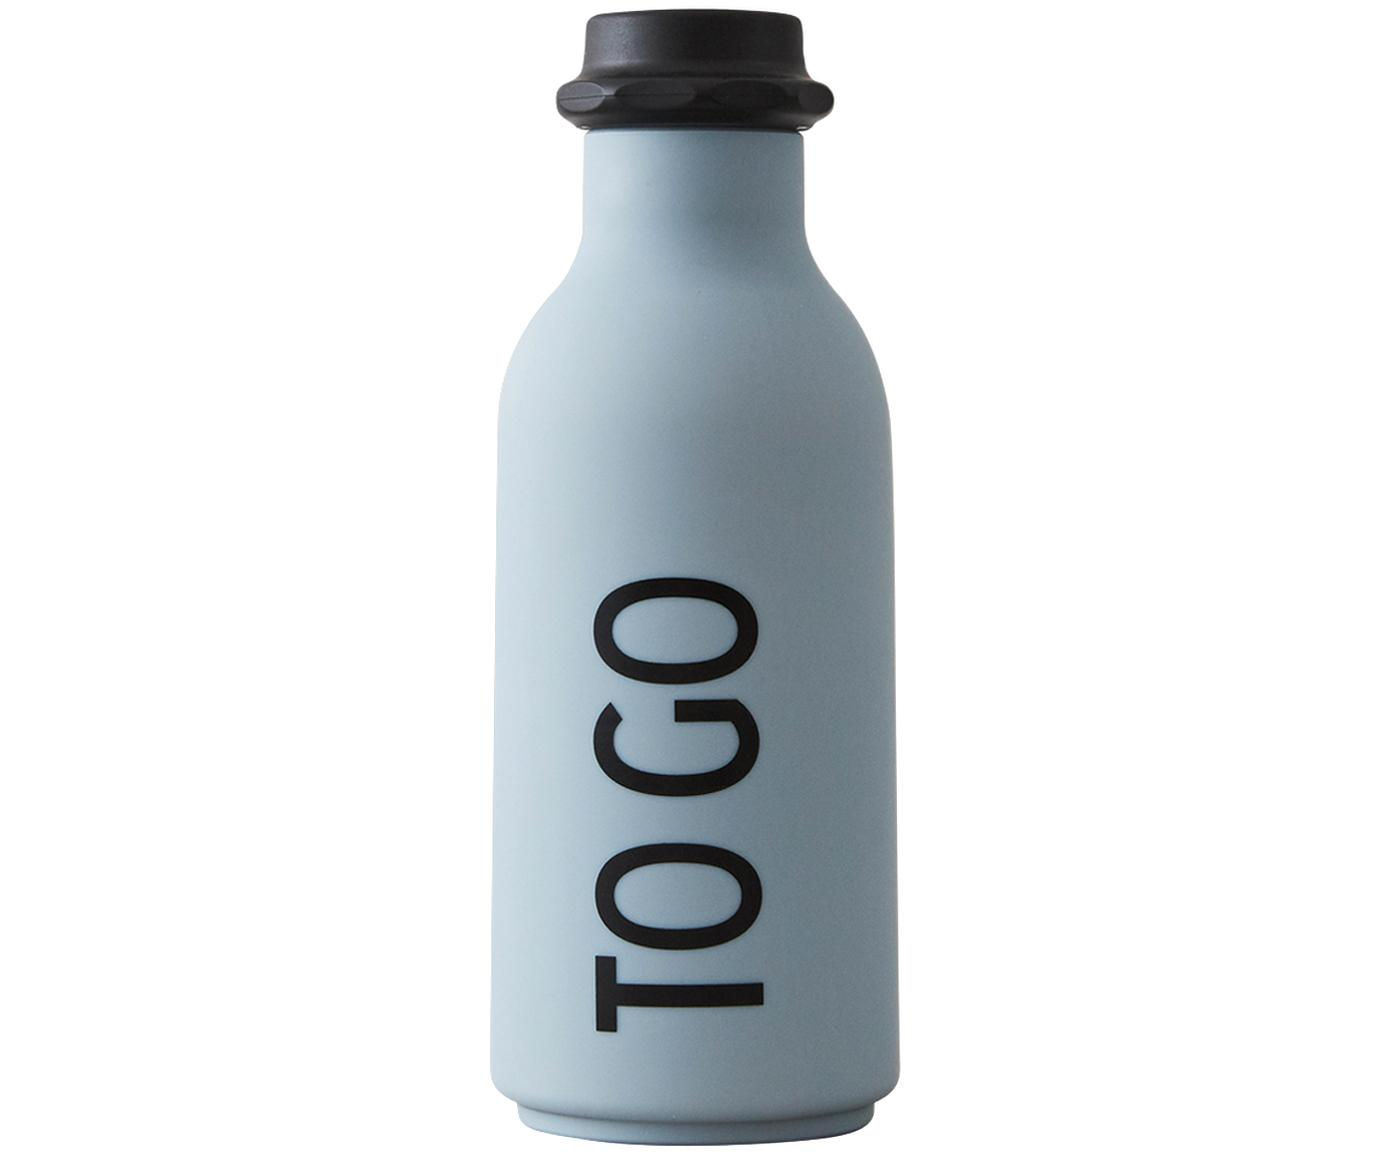 Botella thermo de diseño To Go, Botella: tritan (plástico), libre , Azul claro, negro, Ø 8 x Al 20 cm